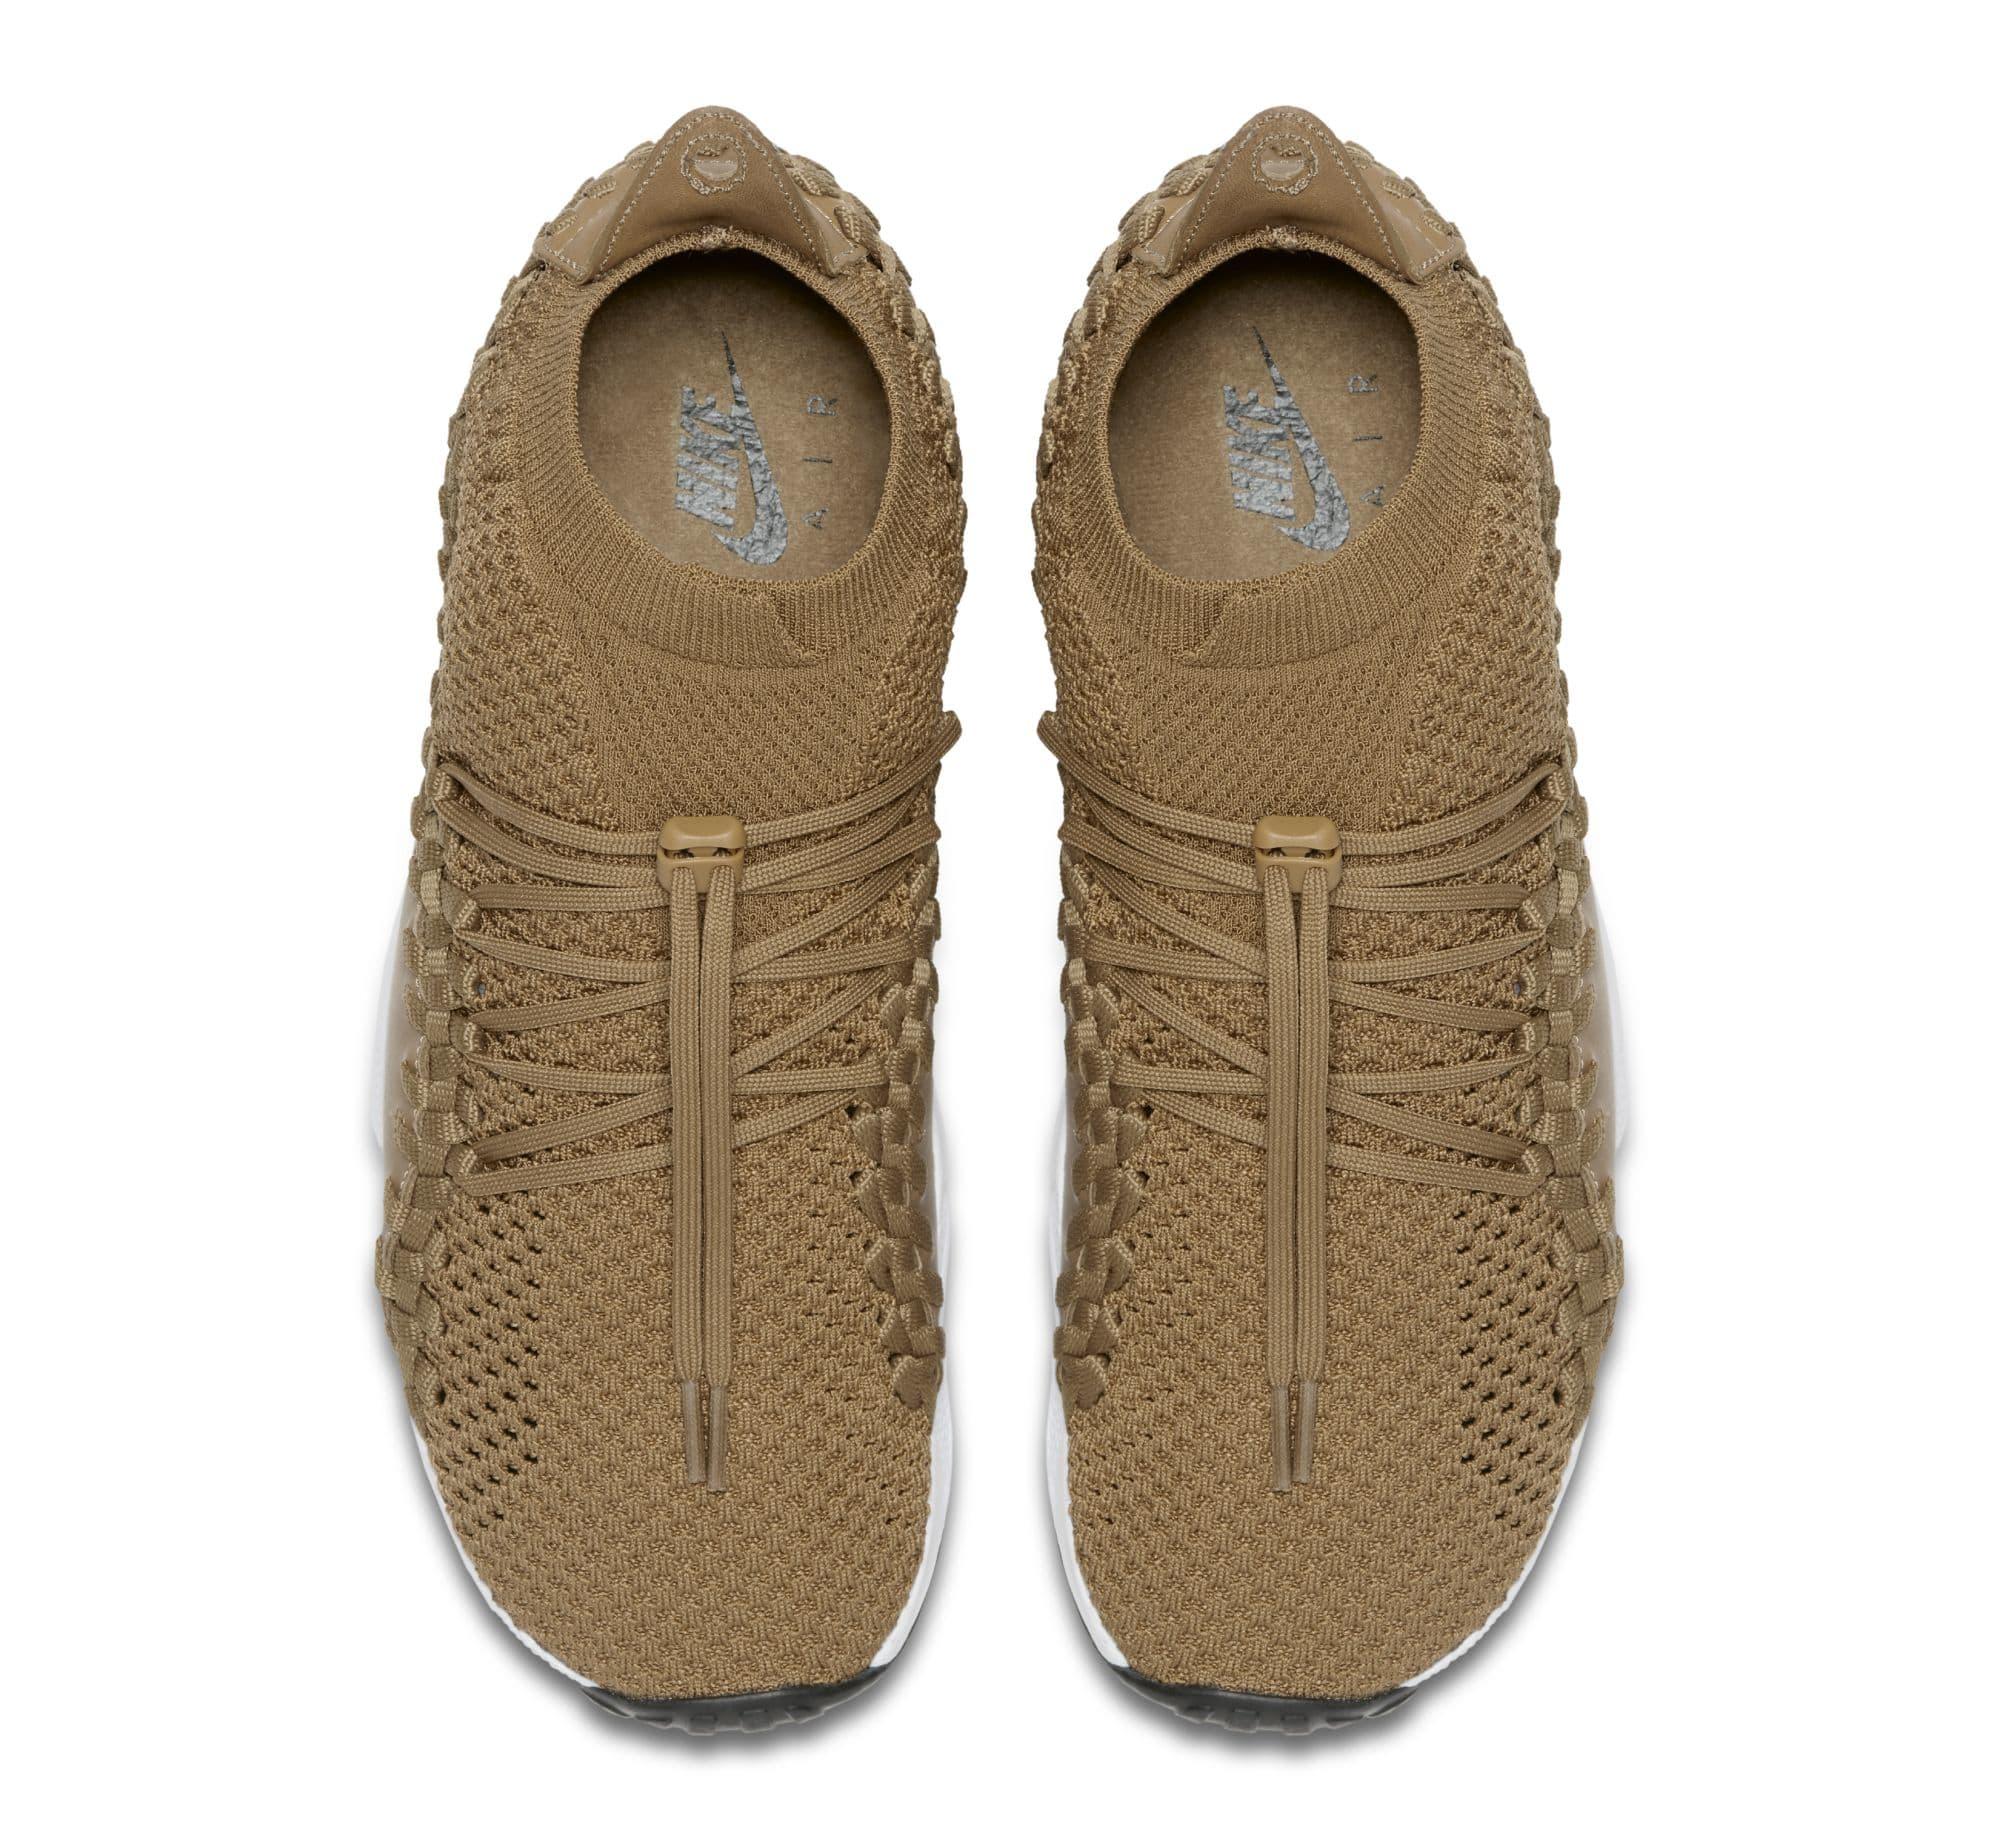 Nike Footscape Woven Chukka Flyknit 'Golden Beige' AO5417-400 (Top)